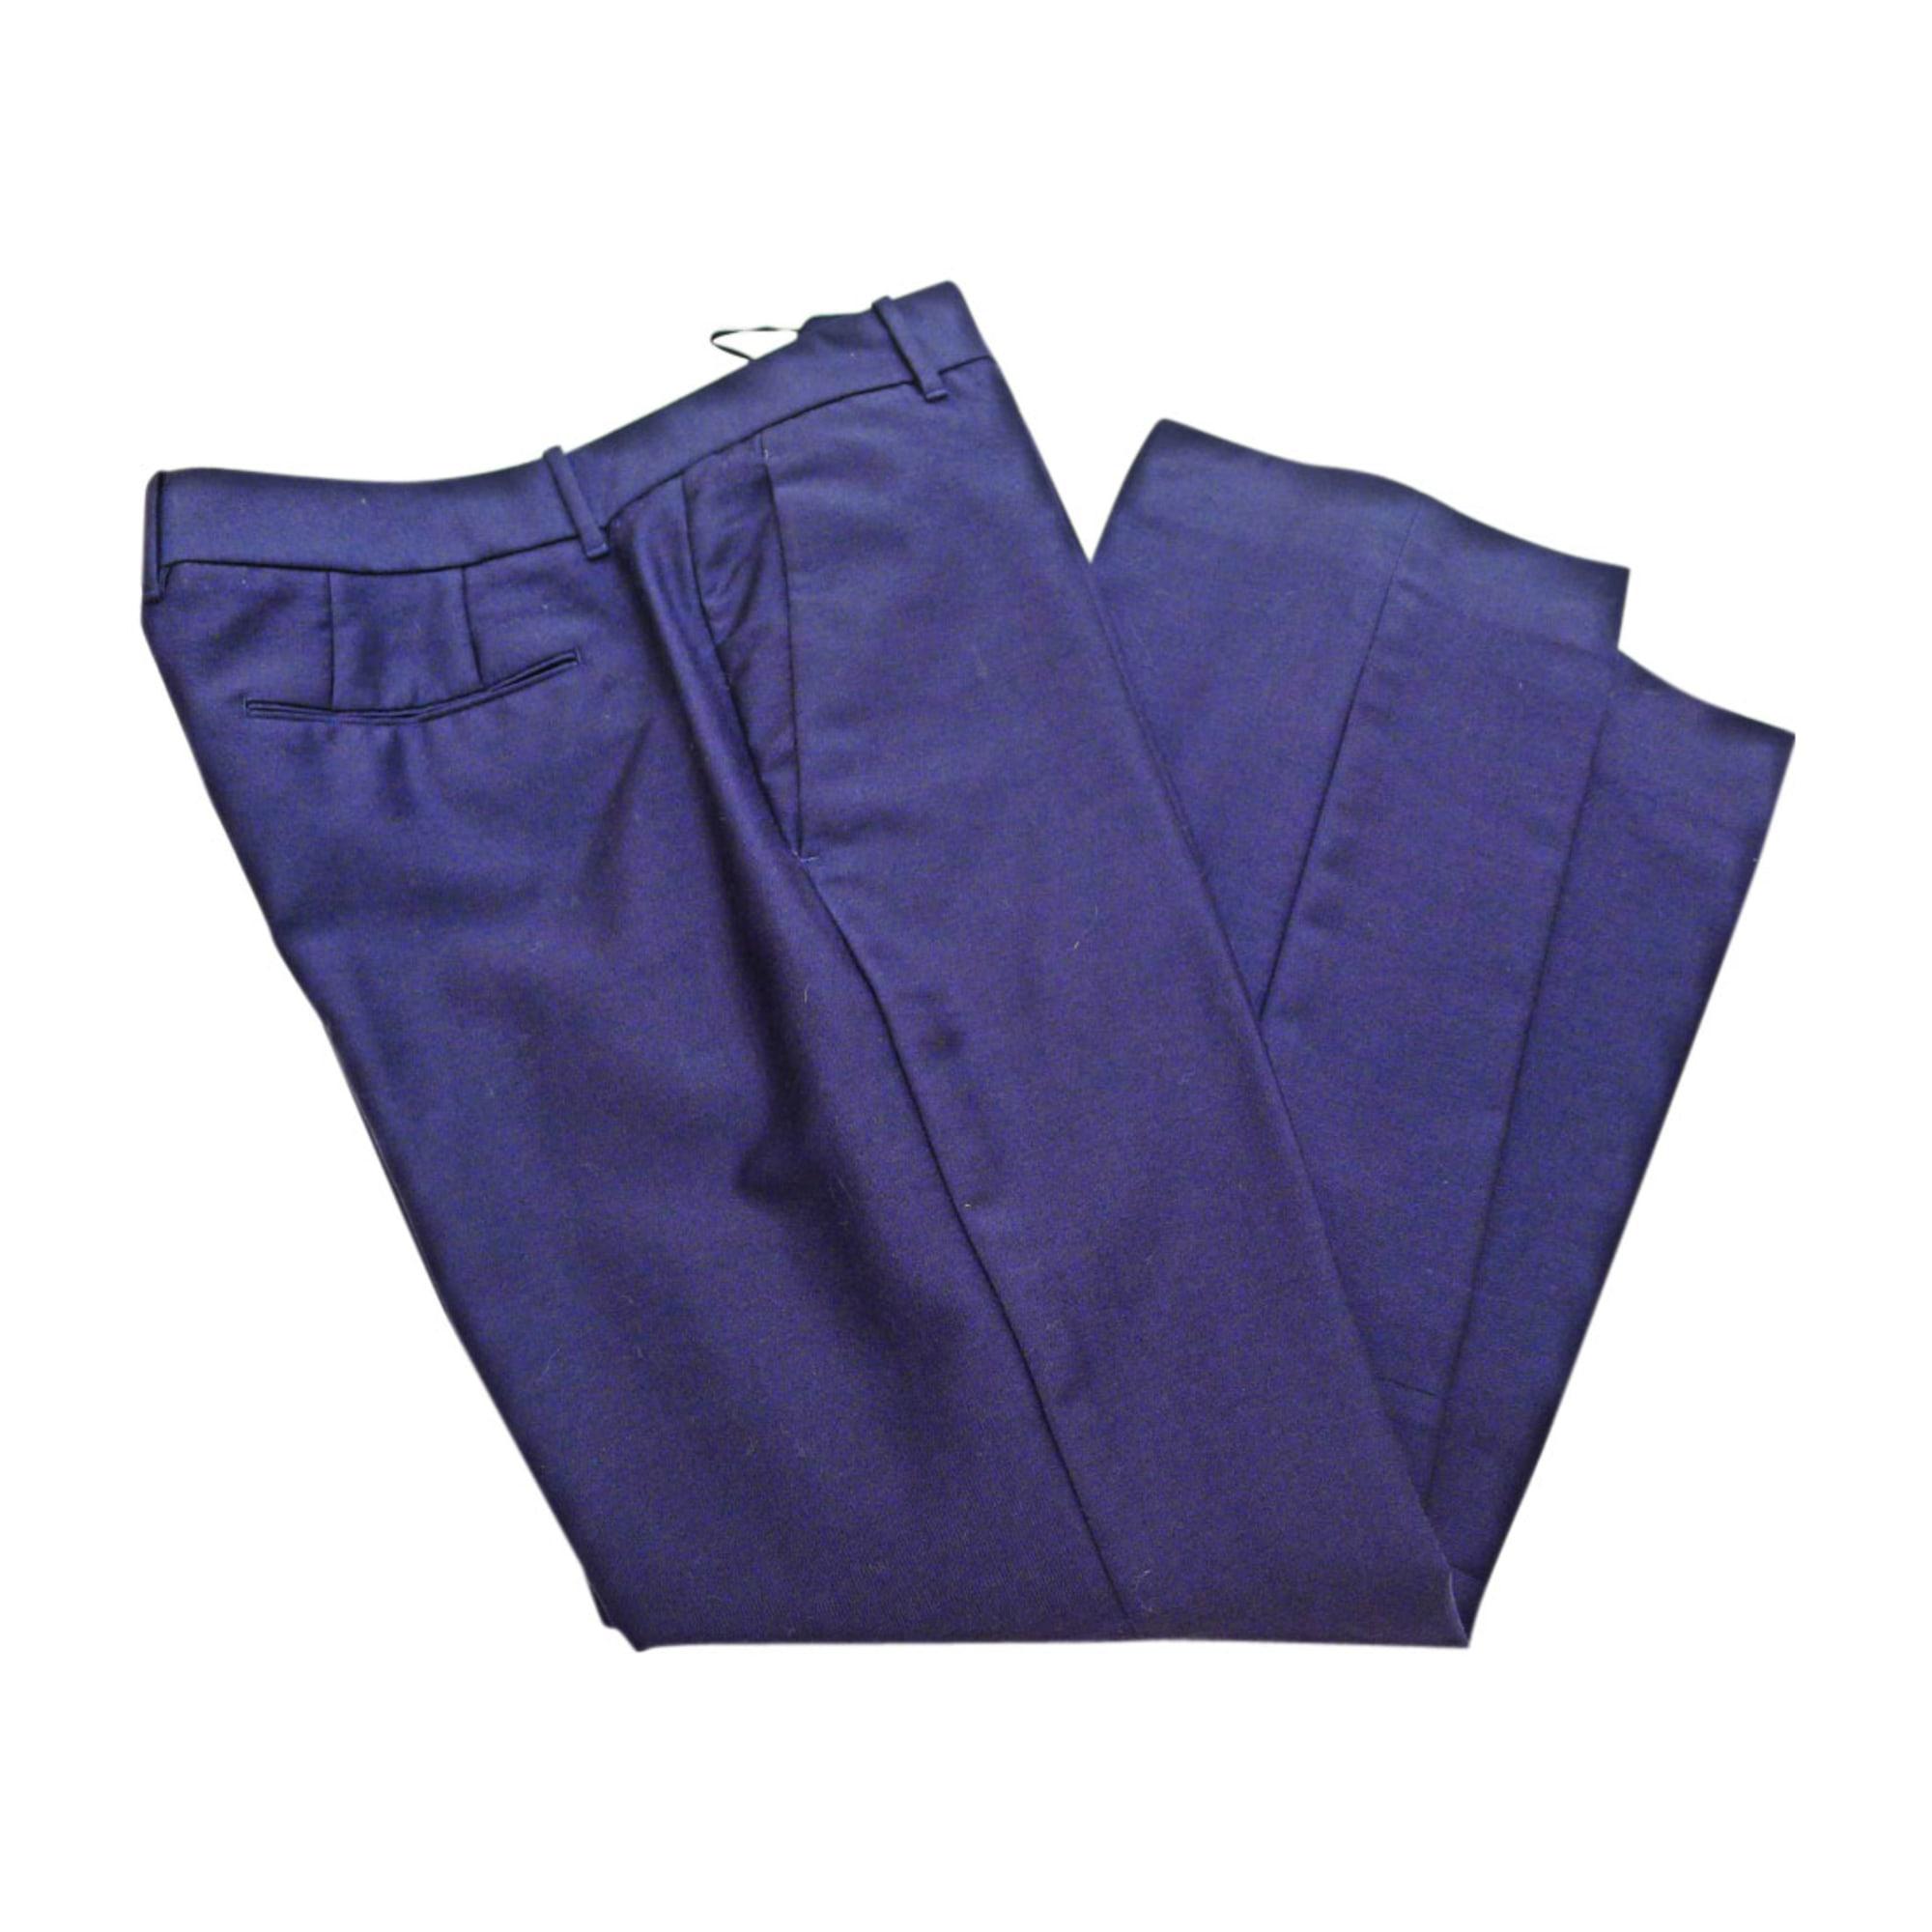 Pantalon droit JIL SANDER Bleu, bleu marine, bleu turquoise